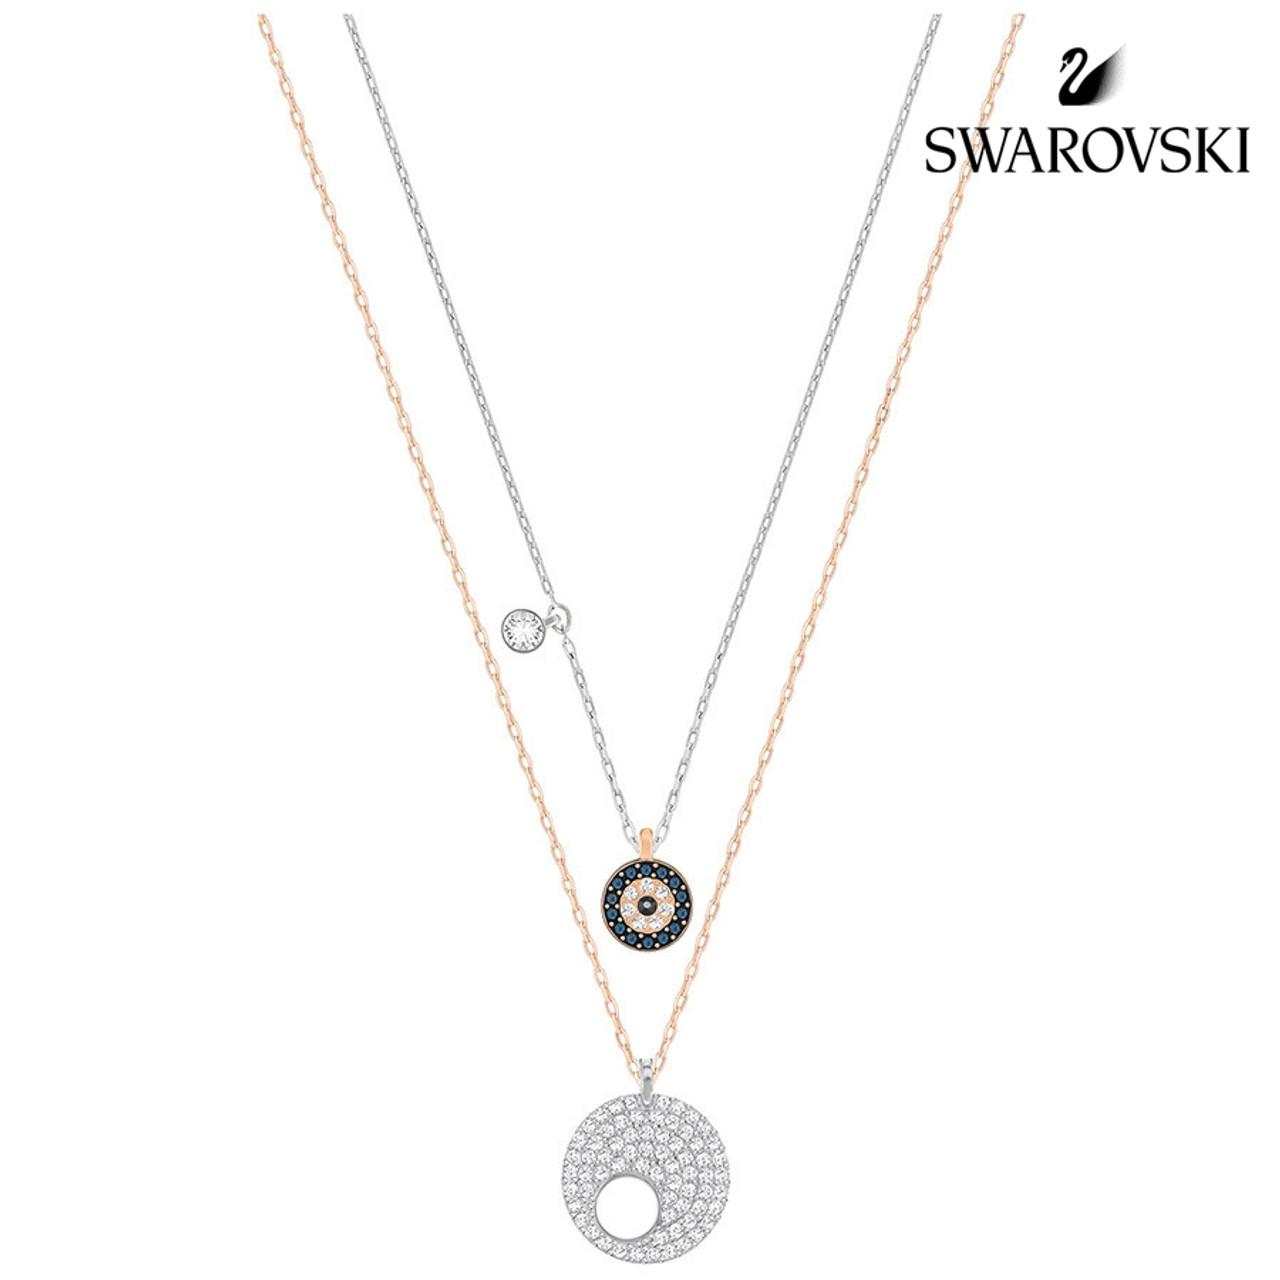 Swarovski-Crystal-Wishes-Evil-Eye-Pendant -Set-Mixed-plating-5272243  10343.1531024005.jpg c 2 imbypass on 484d6d973647